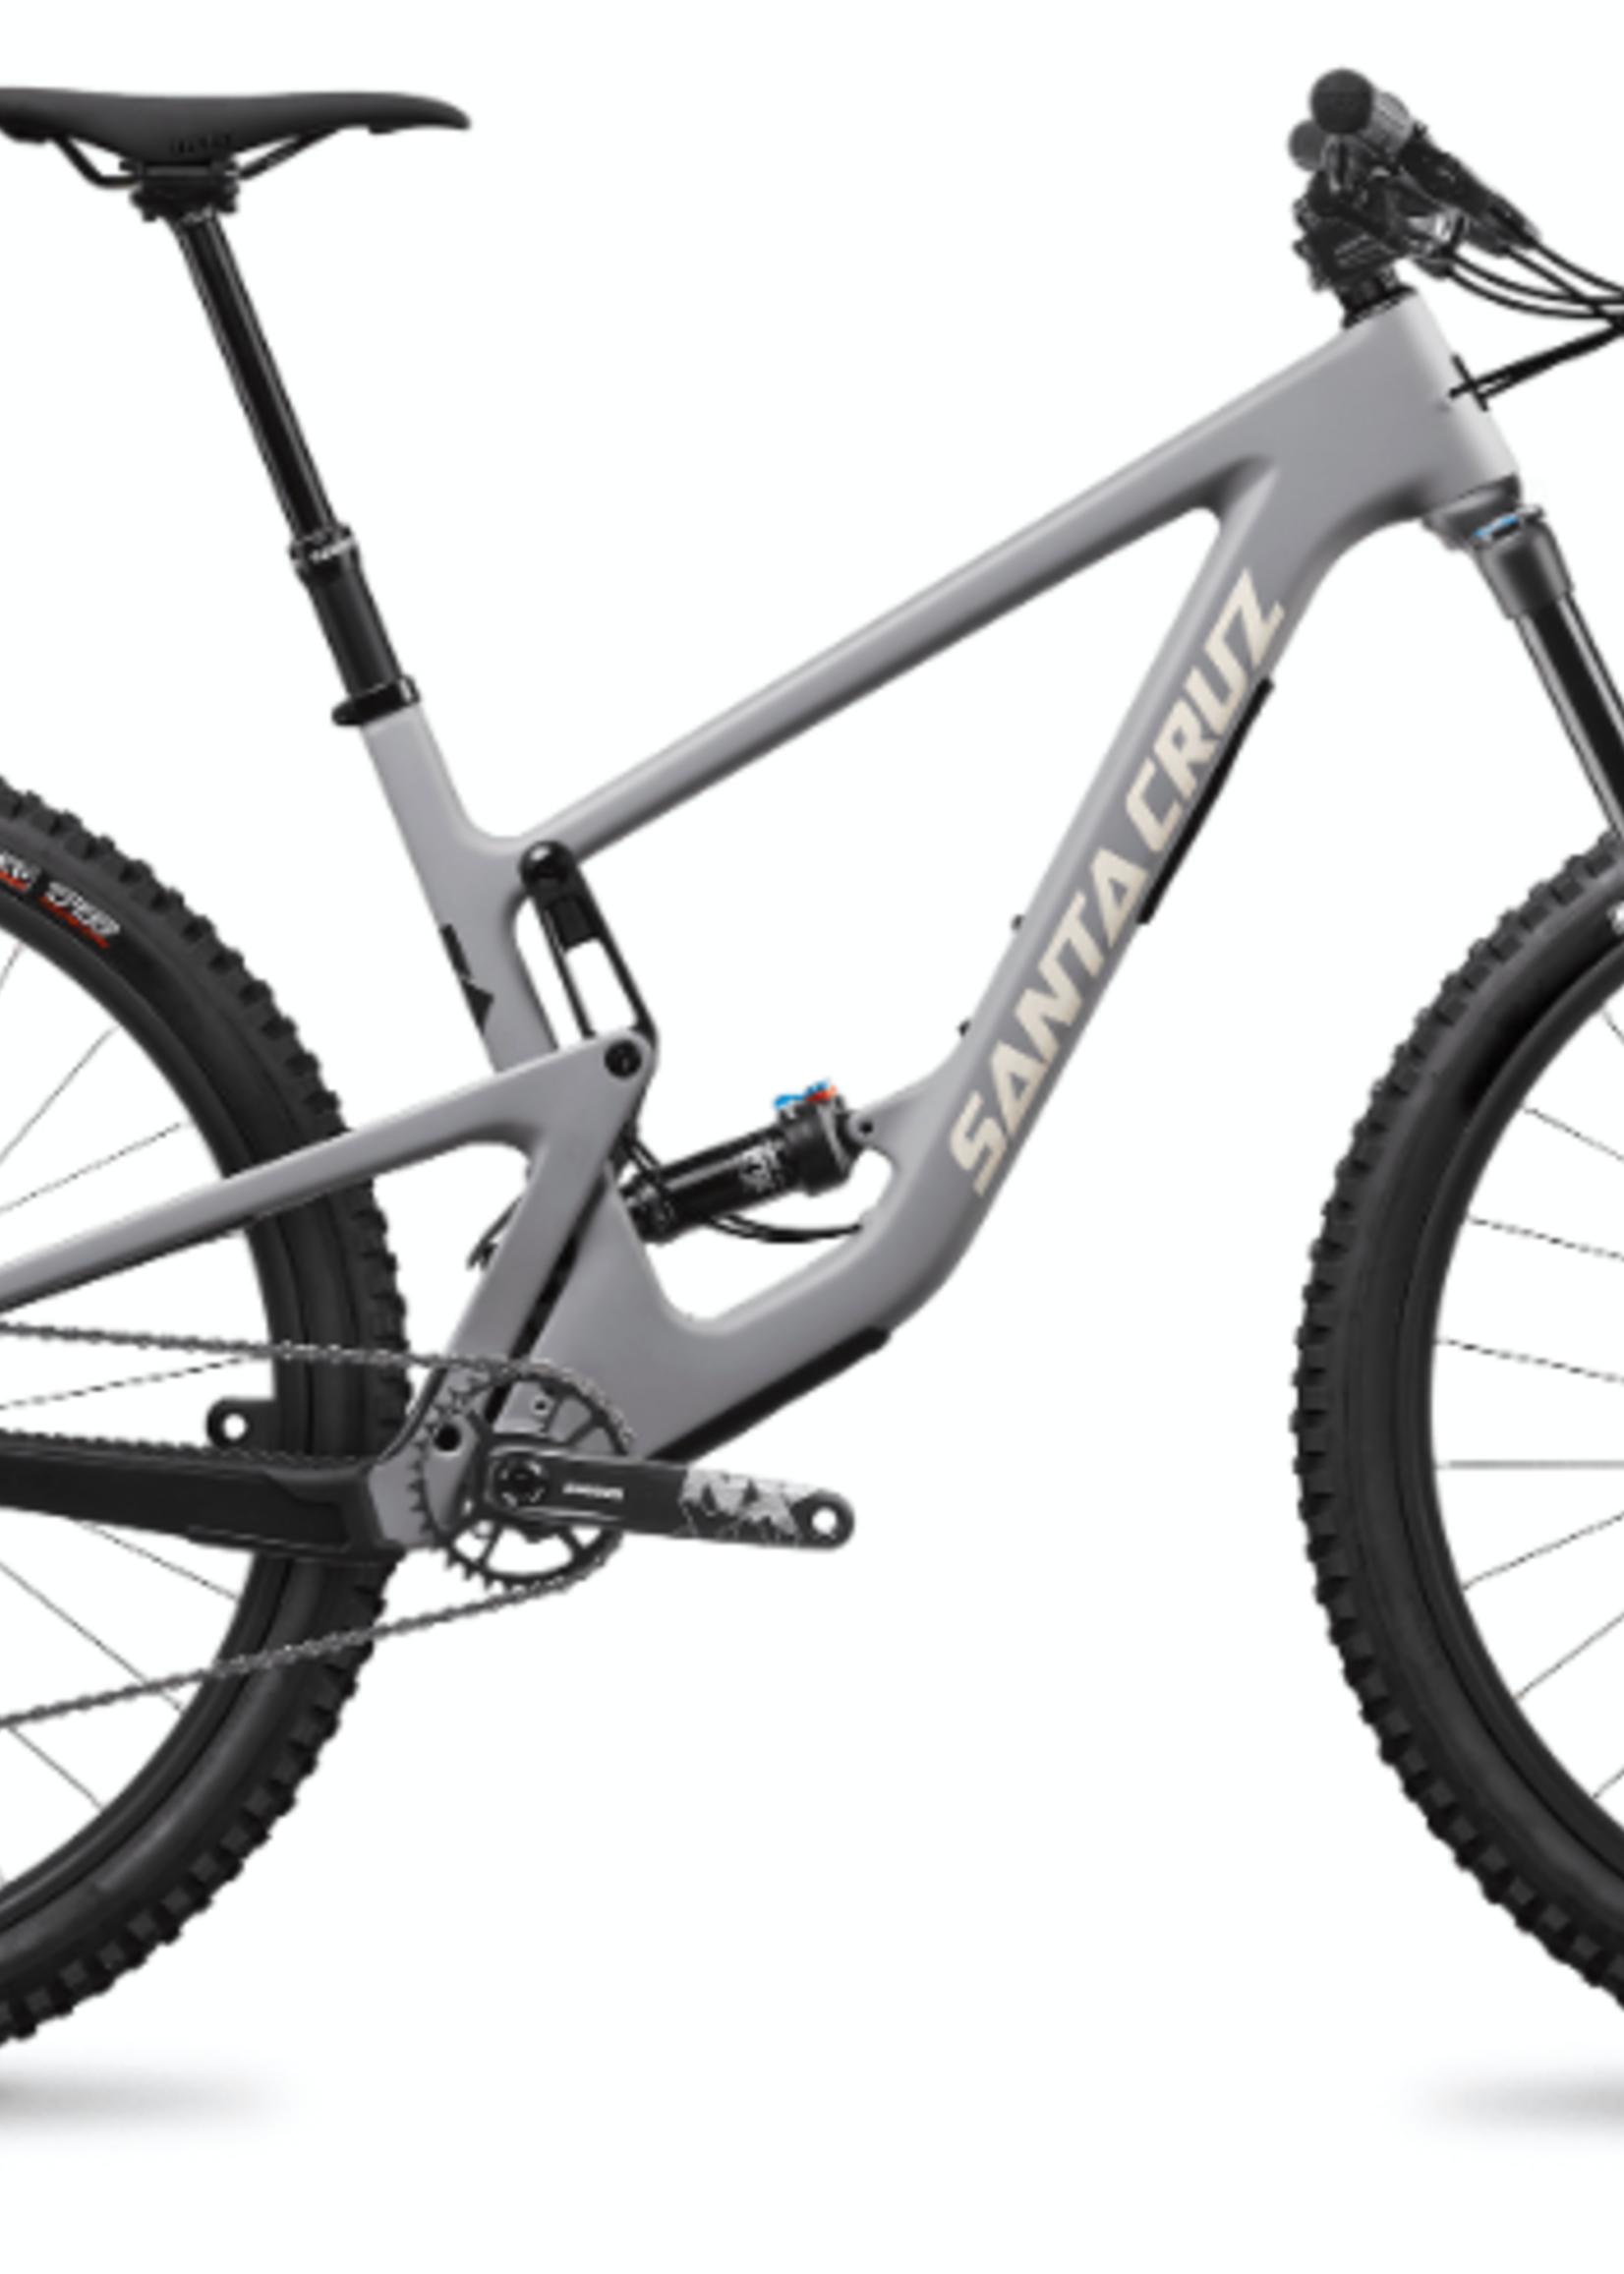 "Santa Cruz Santa Cruz Hightower 2 2021 | S Kit | Carbon C | 29"" Mountain Bike - Grey - Small"